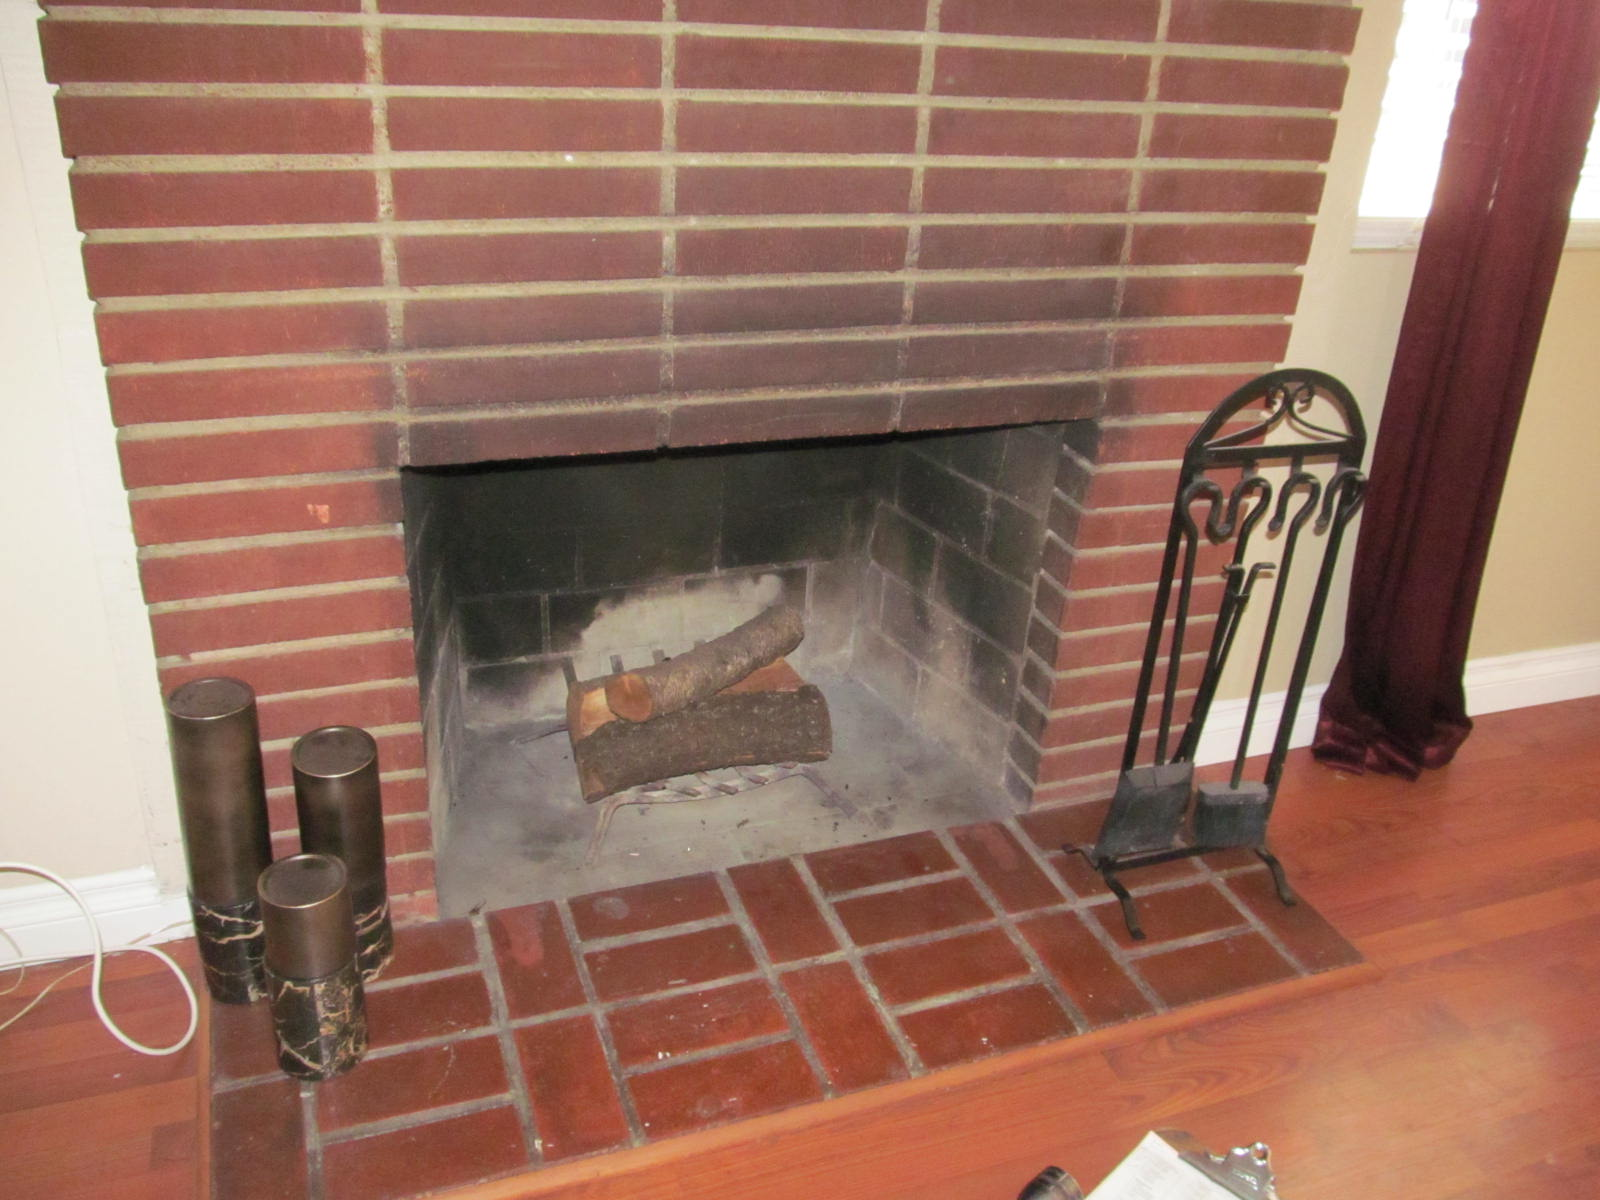 Smoke on face of fireplace